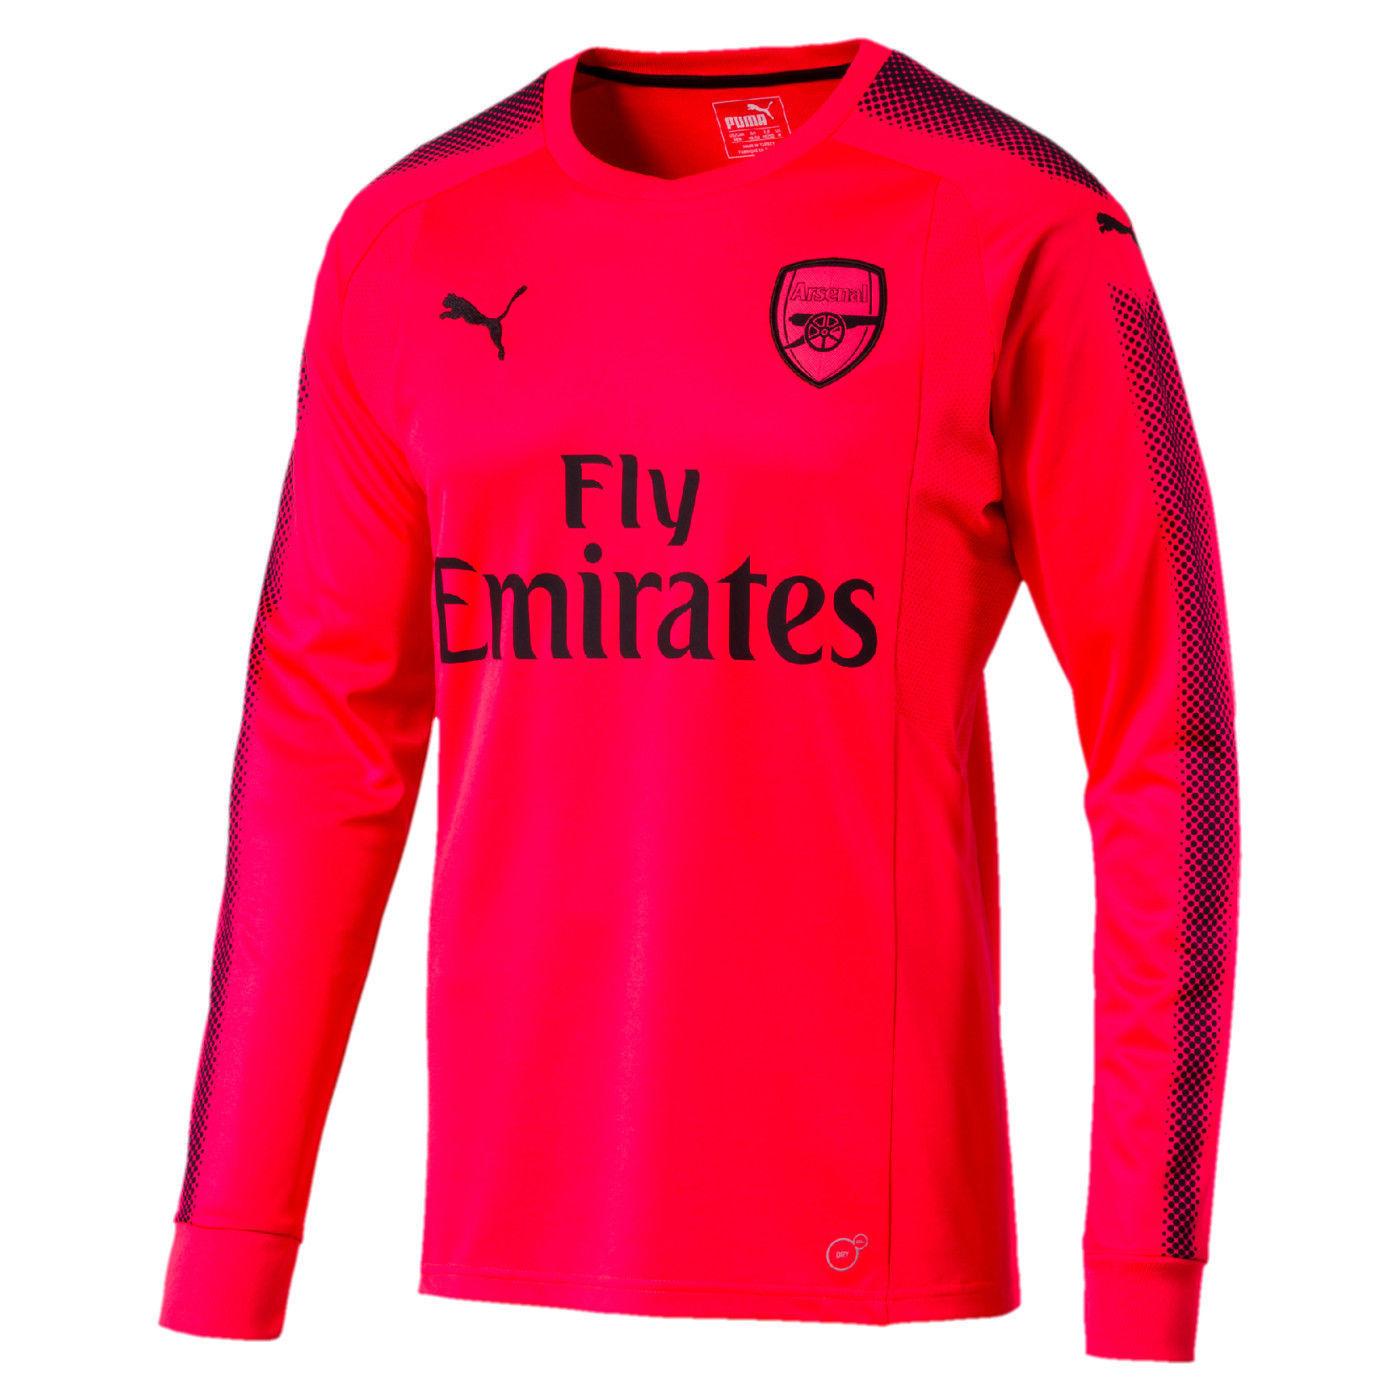 89e3396bb84 Puma Arsenal Goalkeeper Jersey 2017-2018 and 50 similar items. S l1600